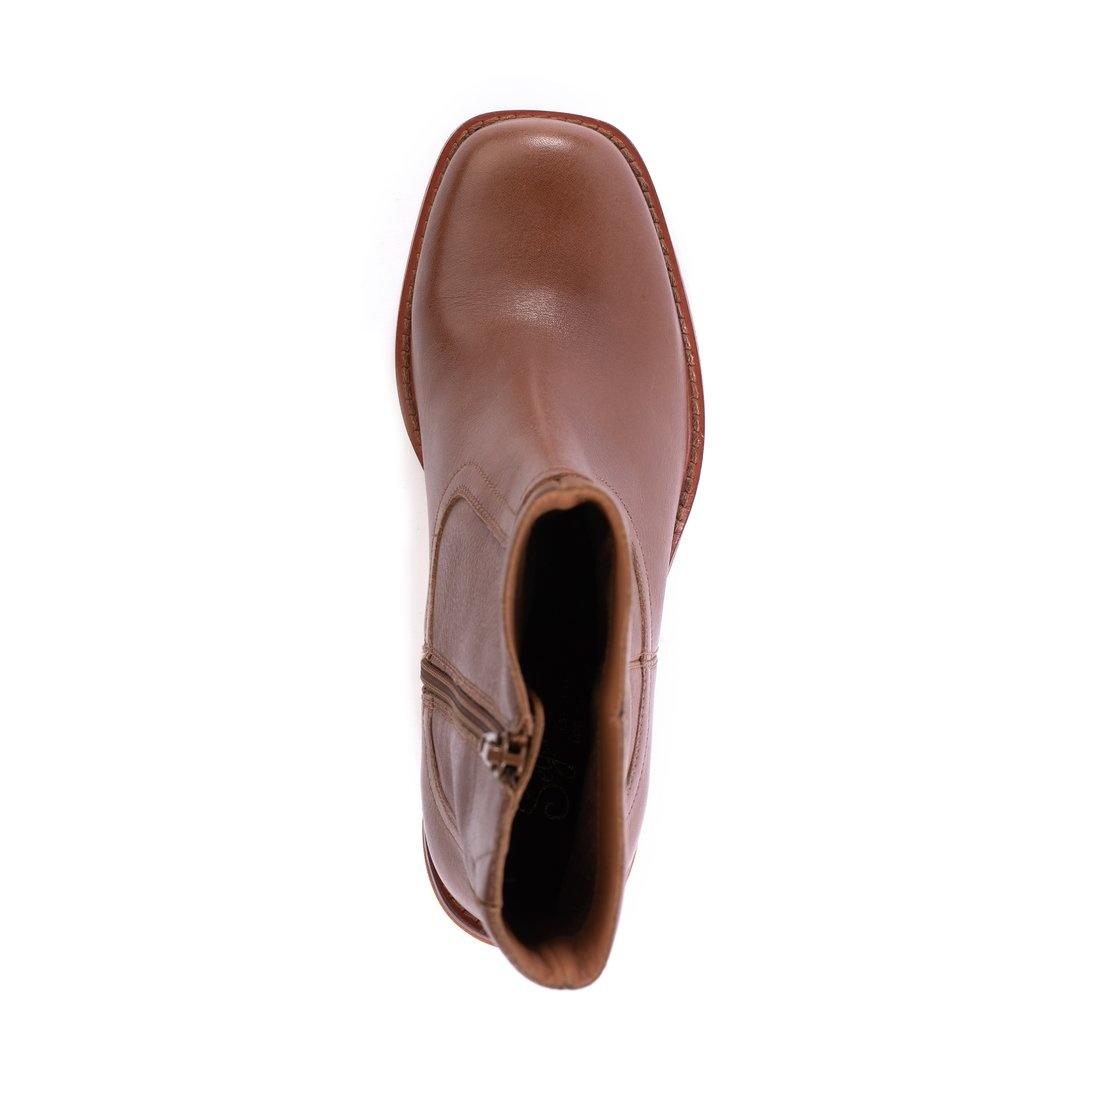 Seychelles Turbulent Tan Boot